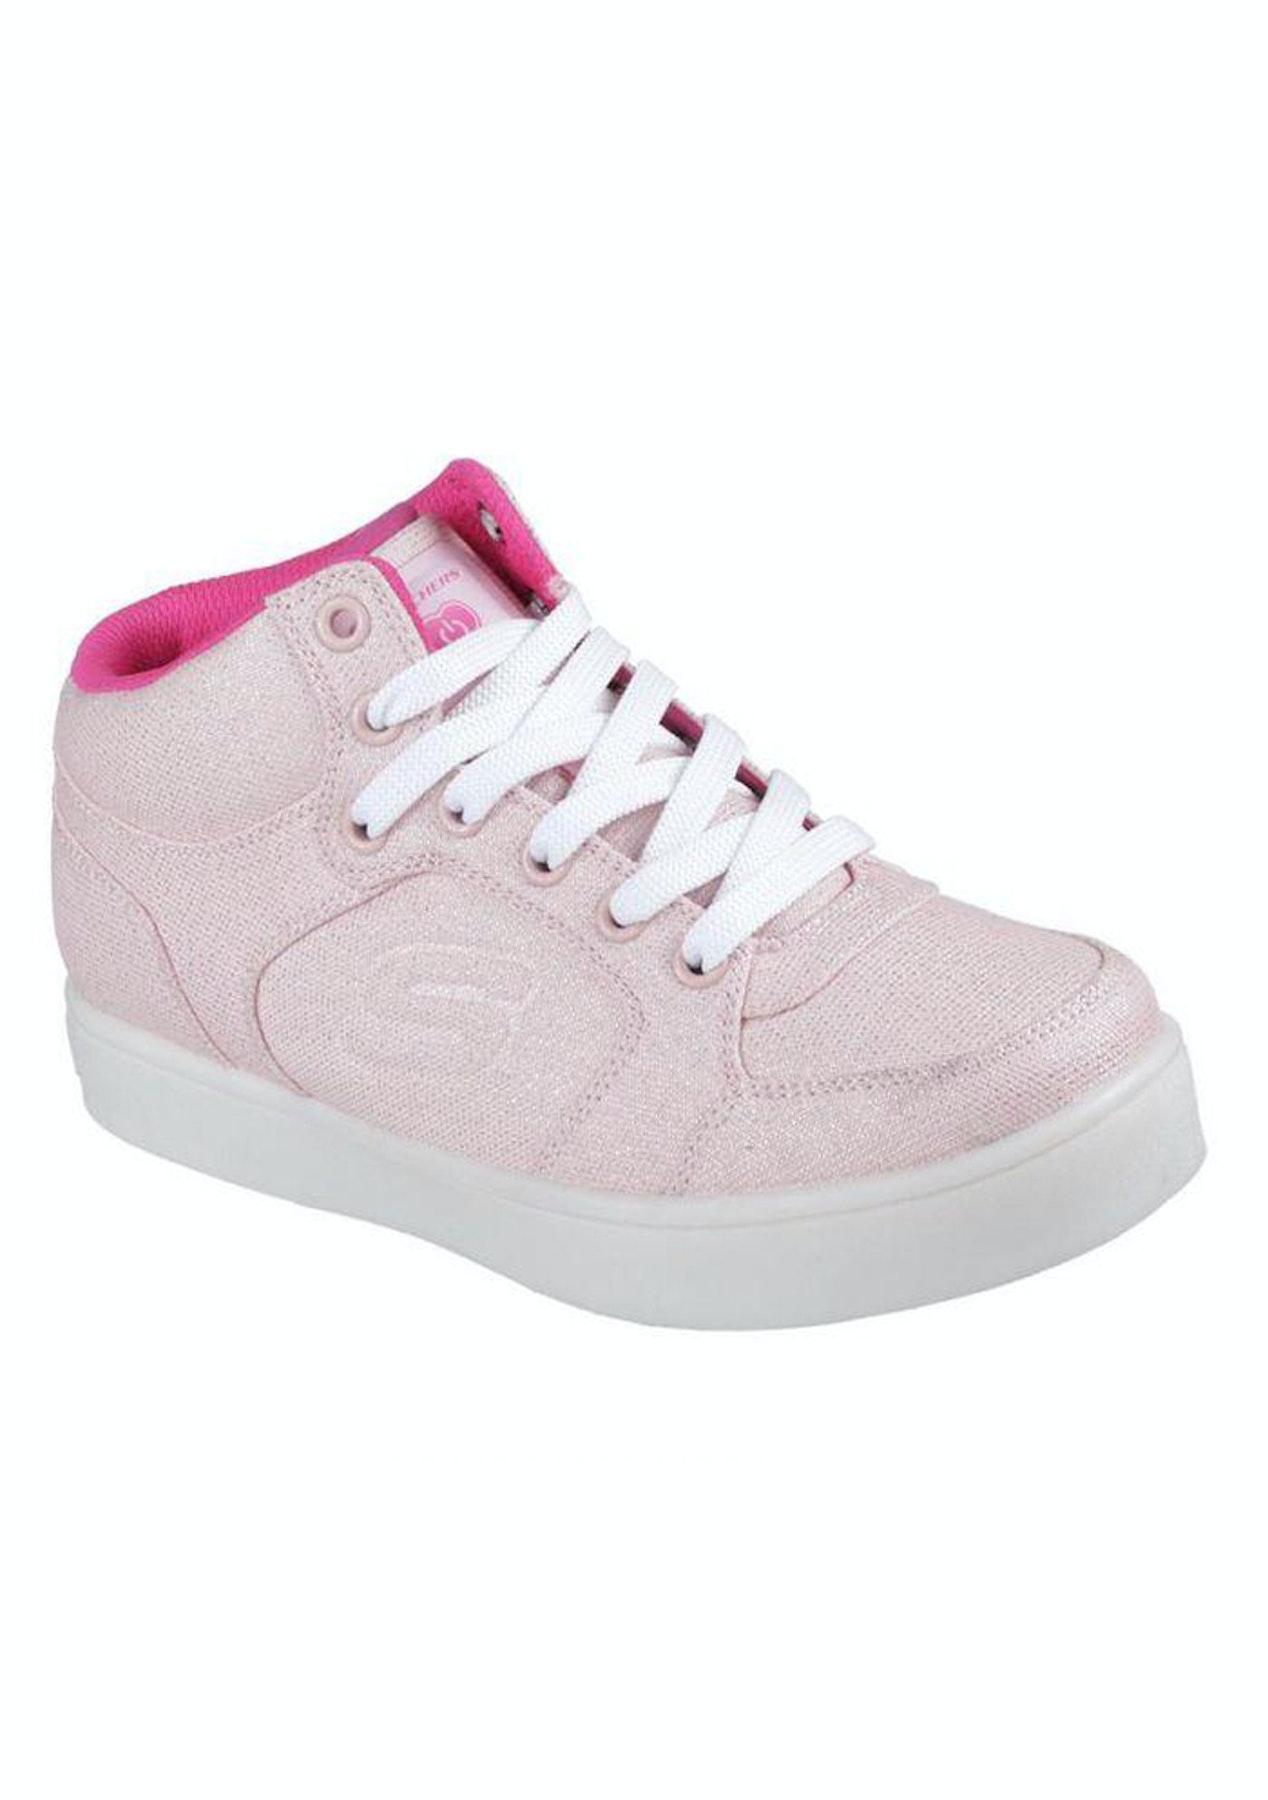 7c5764ae949 Skechers - Girls' S Lights: Energy Lights - Limelightz - Big Brand Shoe  Clearance - Onceit